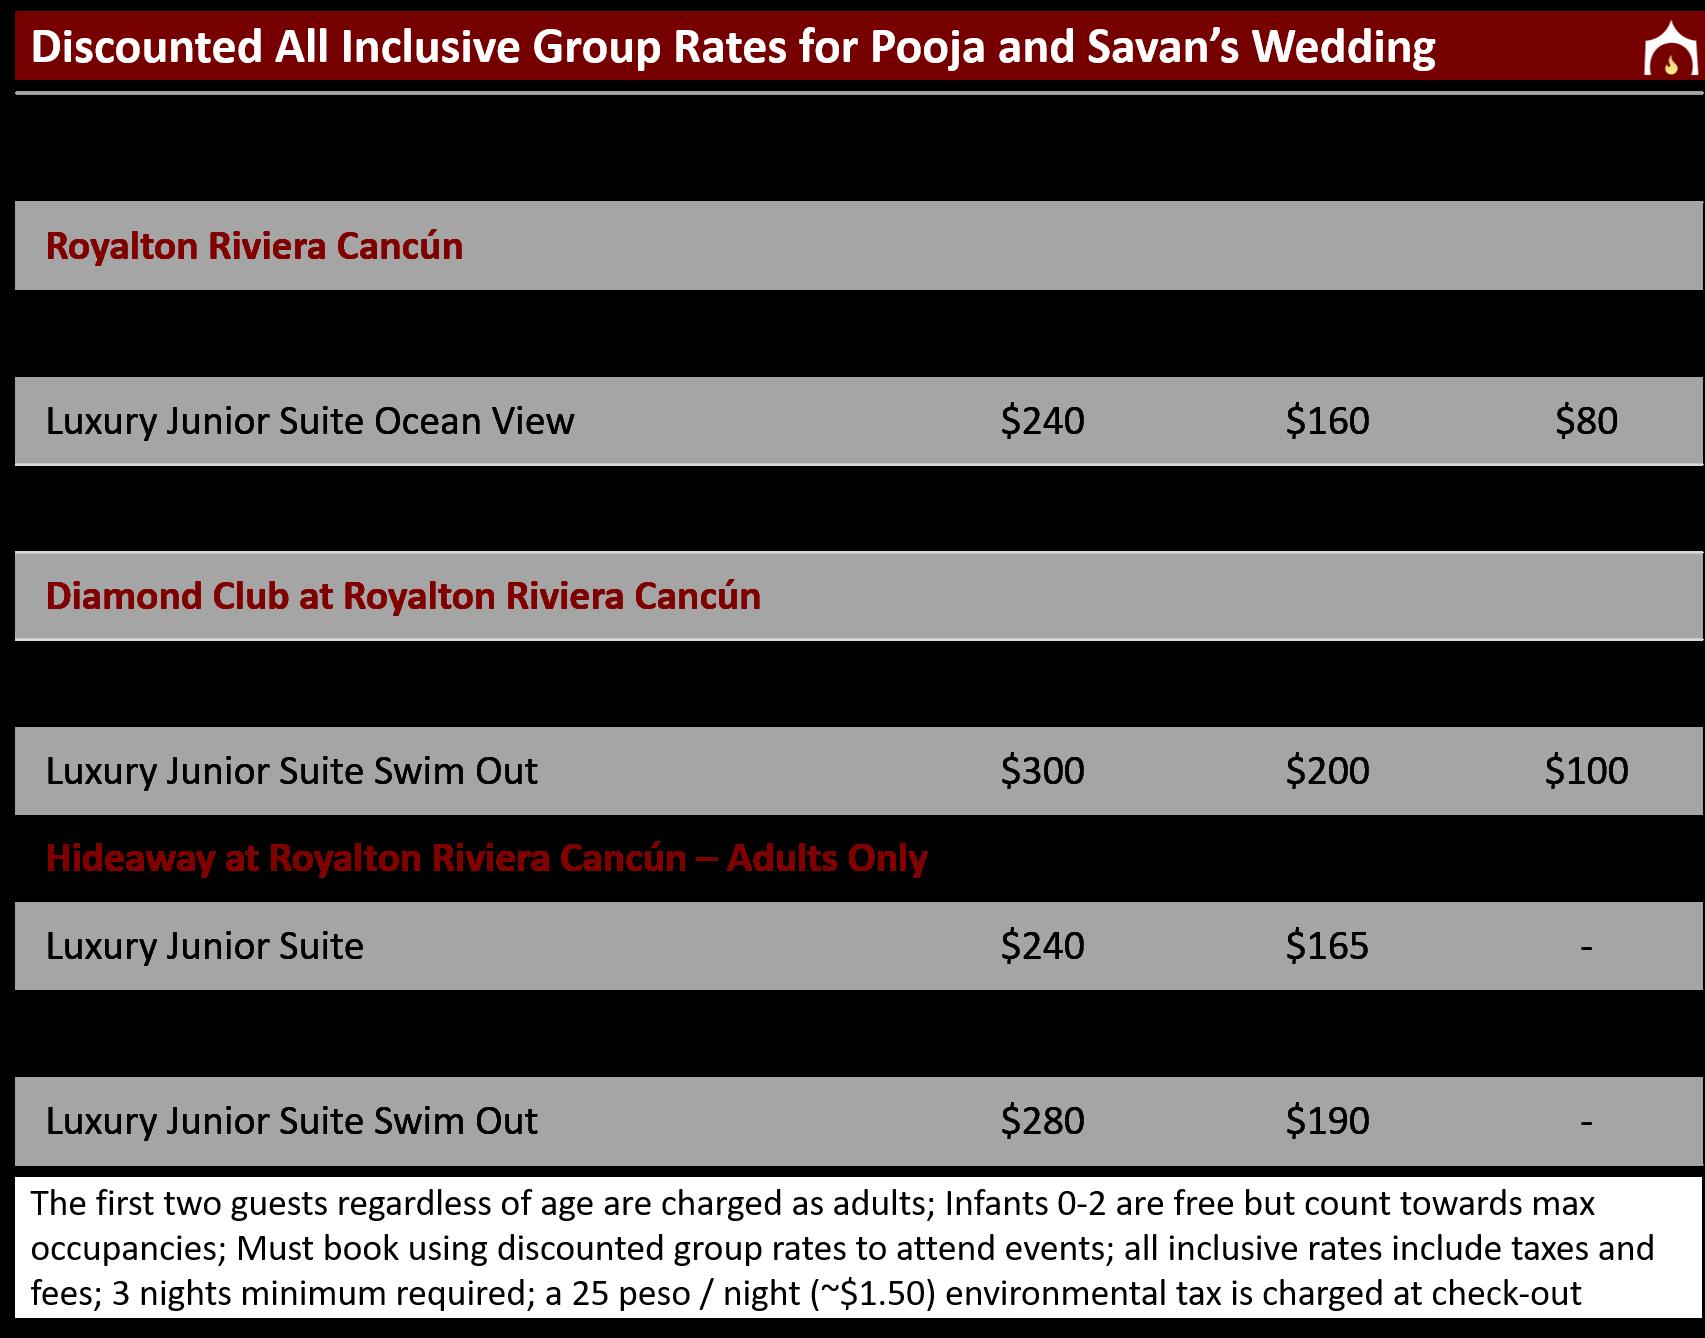 Pooja and Savan - Group Discounted Rate.png